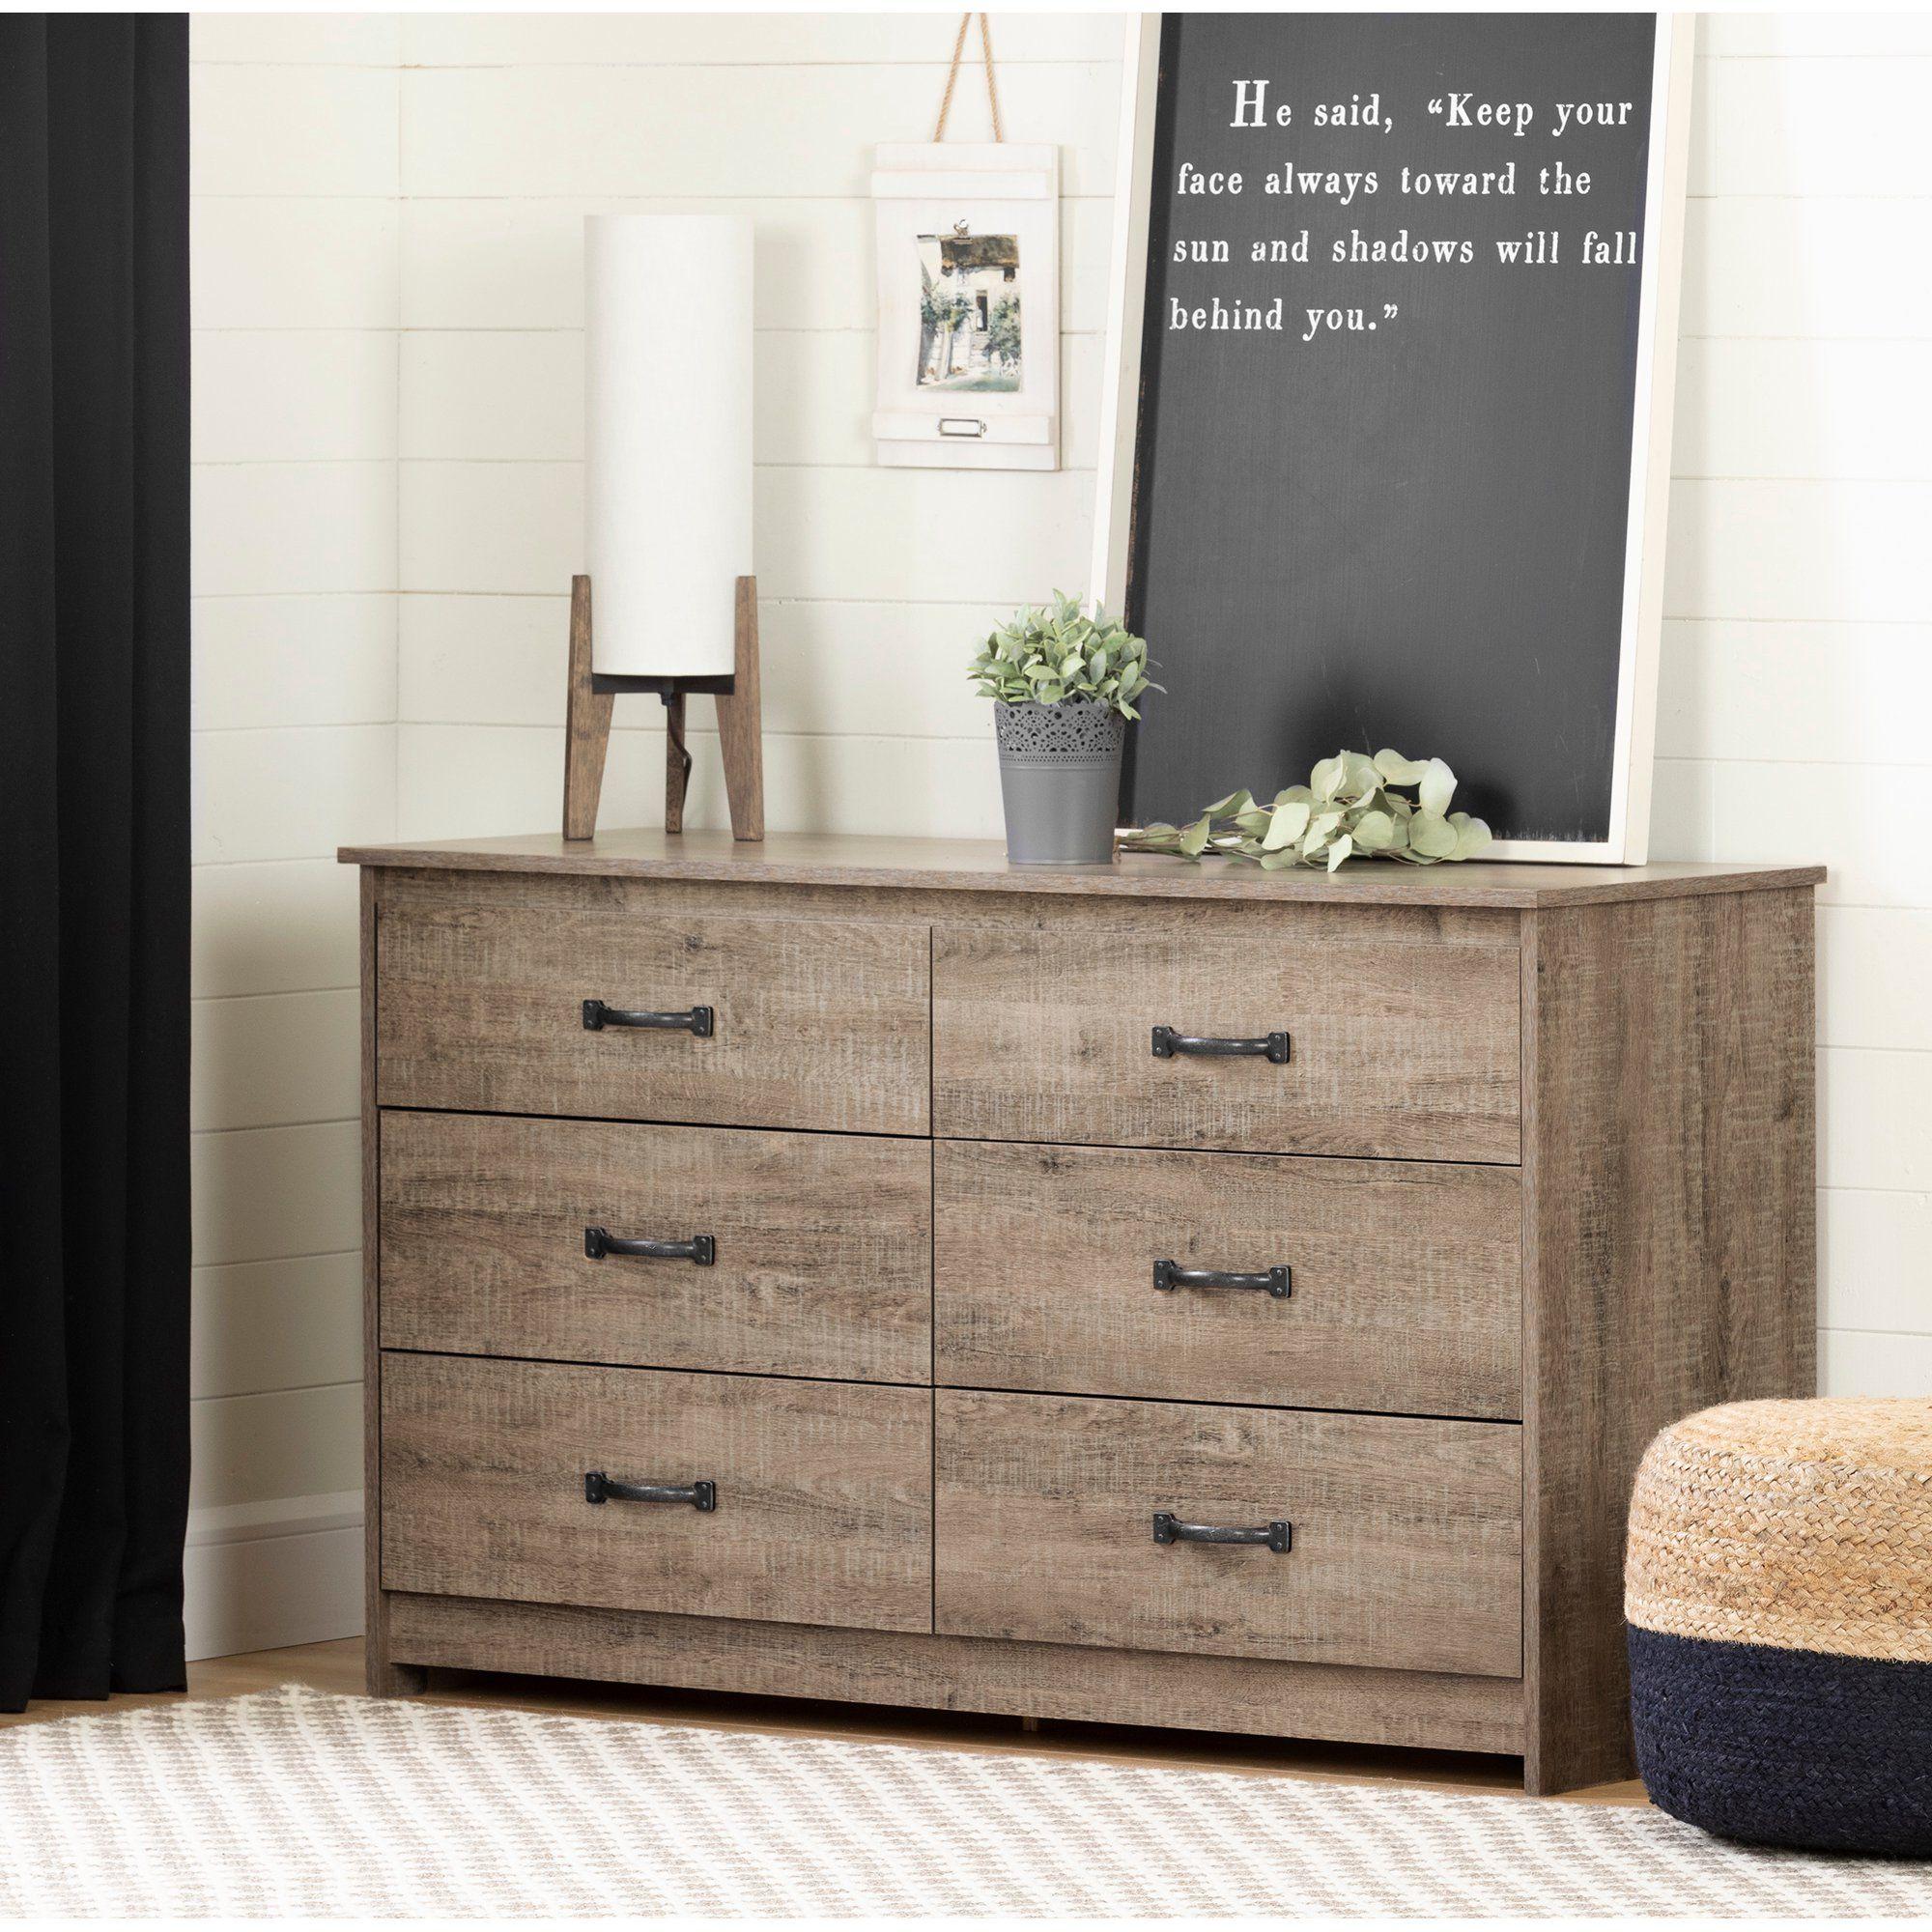 South Shore Tassio 6 Drawer Double Dresser Weathered Oak Walmart Com Oak Dresser Weathered Oak Bedroom Furniture [ 2000 x 2000 Pixel ]